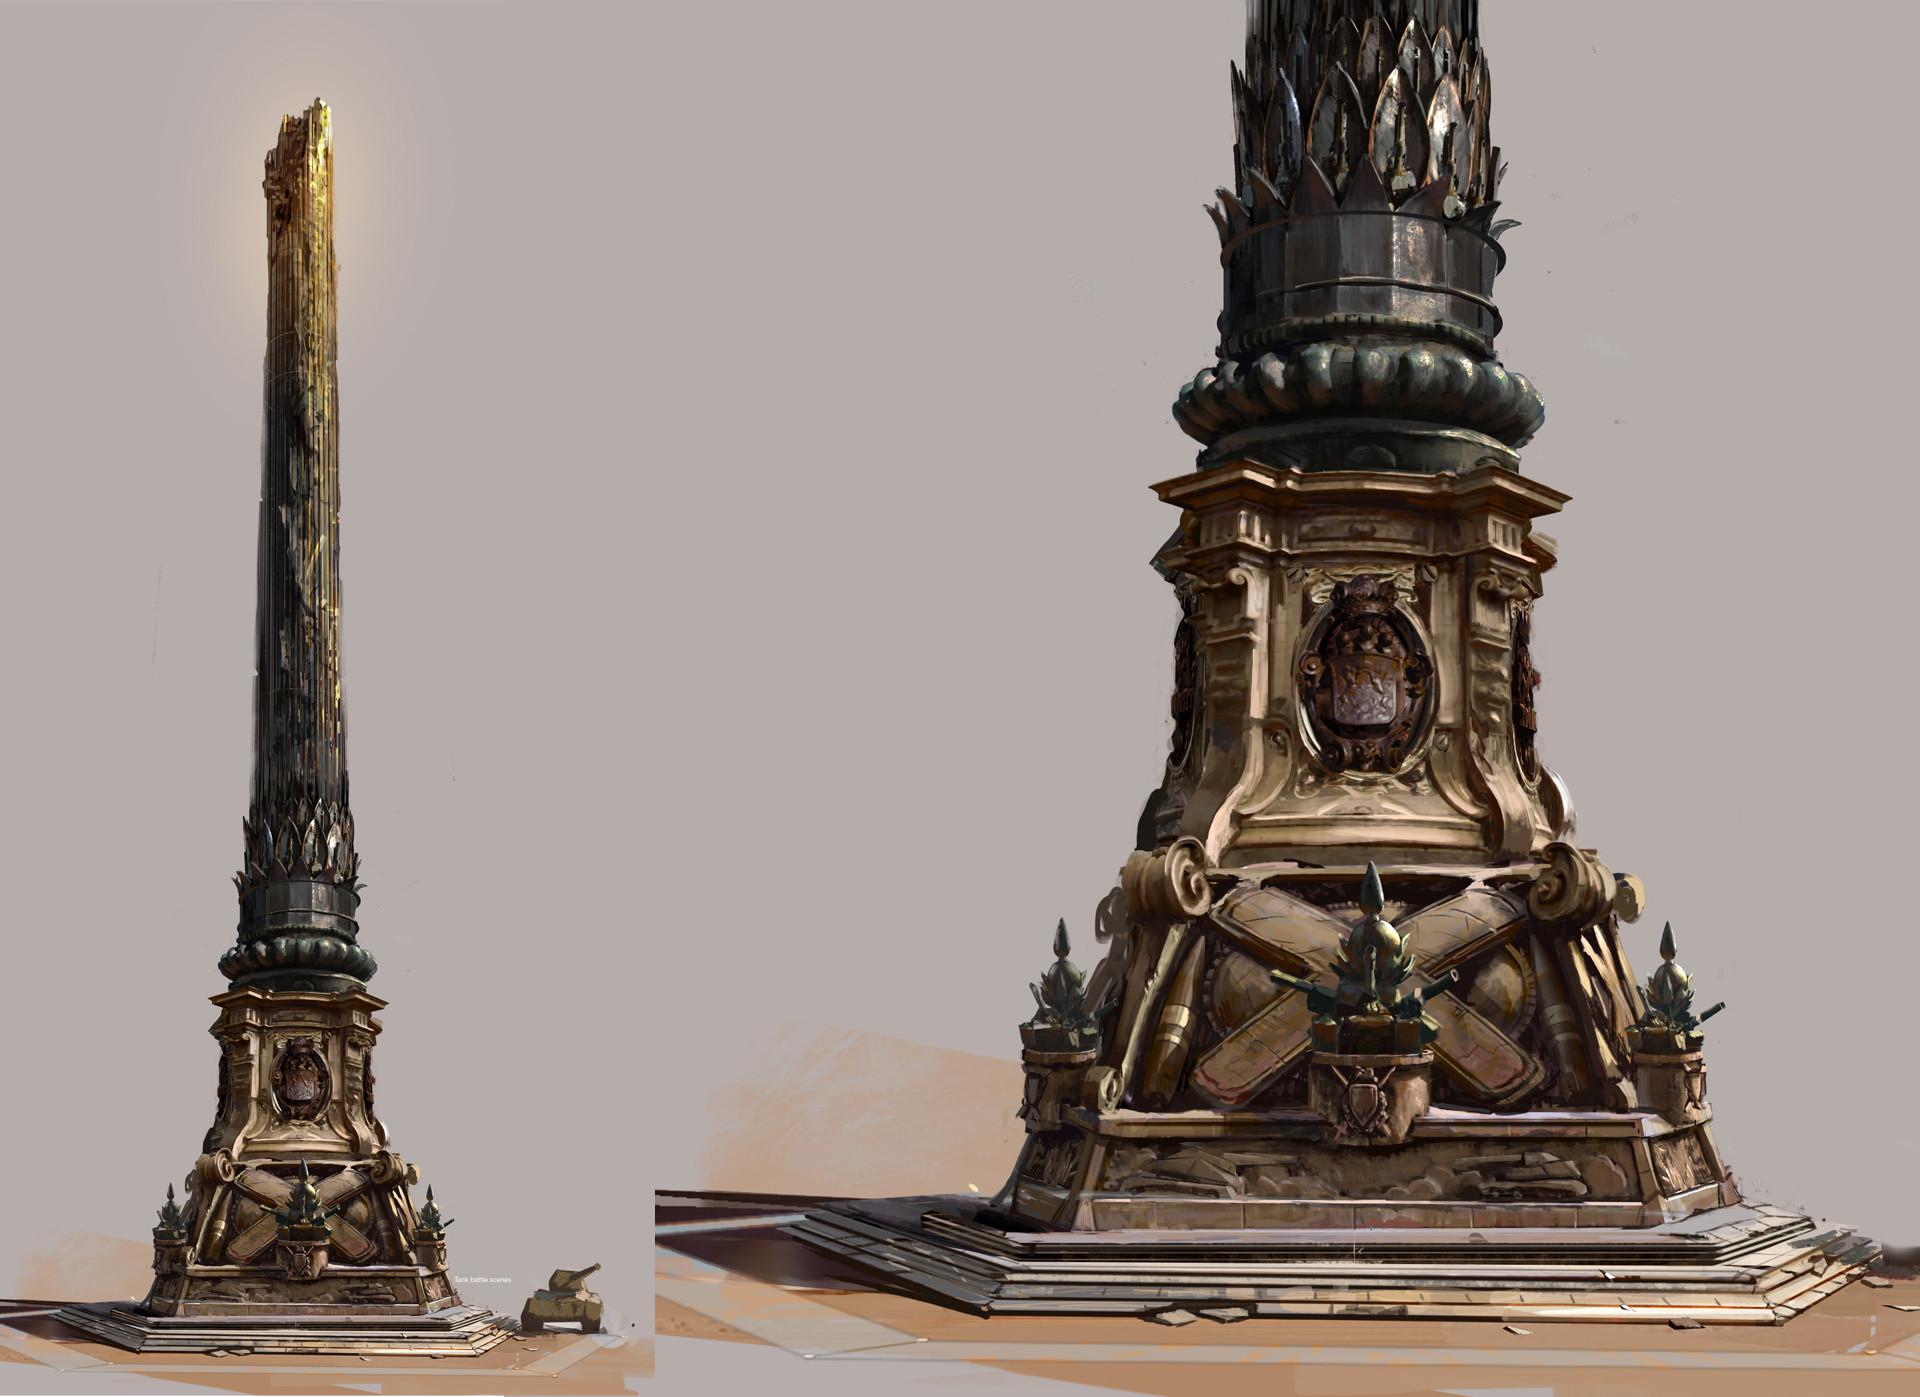 Vilius petrauskas vilius petrauskas okta tanki x obelisk